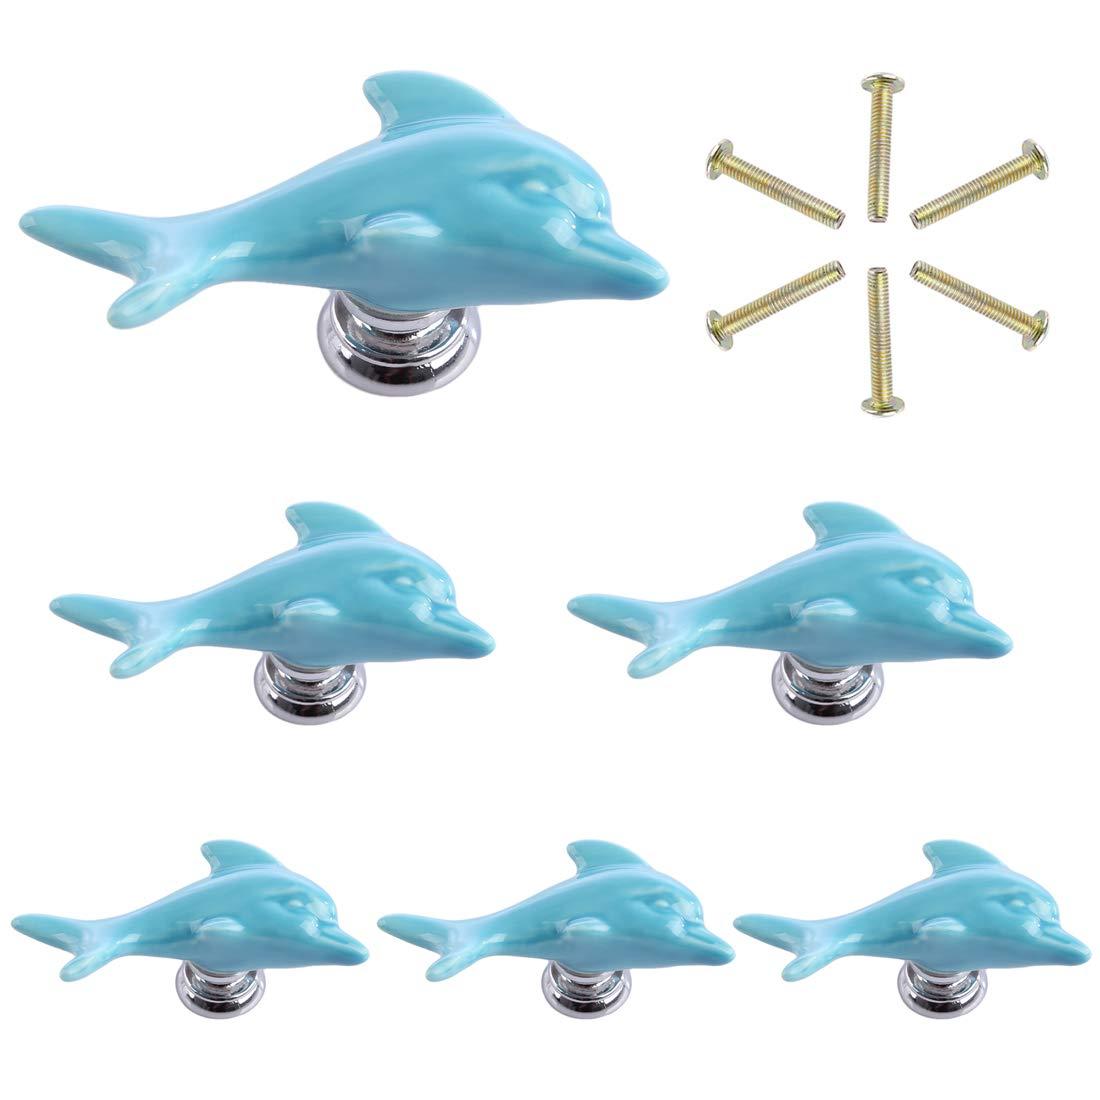 Blau Mecotech 6 St/ück Keramik Delfin T/ürkn/öpfe M/öbelkn/öpfe Schrankgriffe Schrankkn/öpfe M/öbelgriff T/ürknopf f/ür Schrank//Schublade//Kinderzimmer Deko